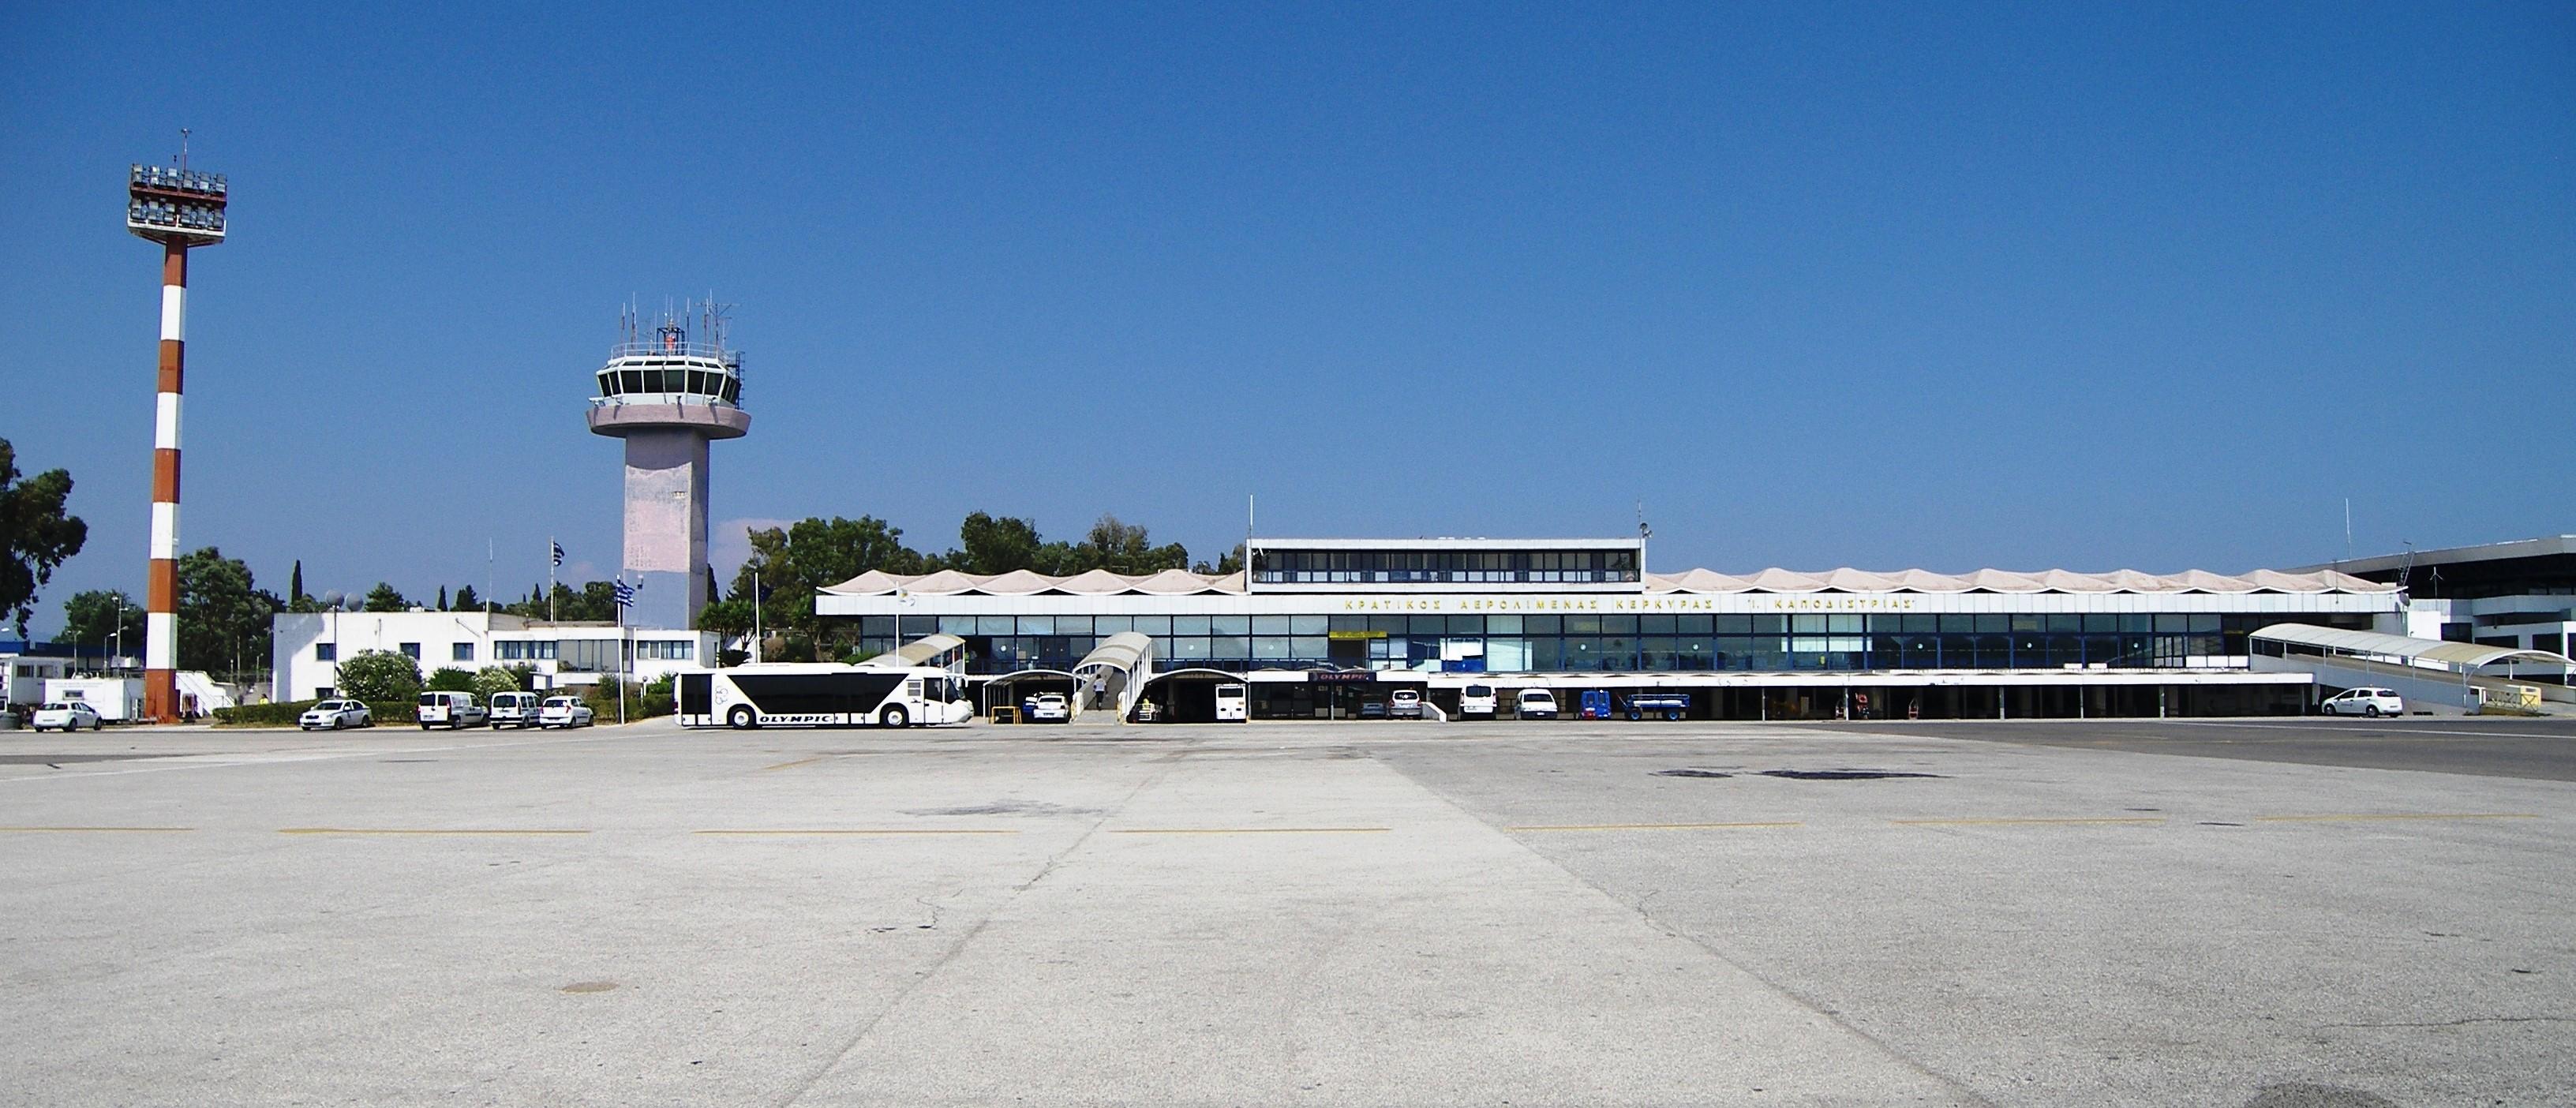 Ioannis_Kapodistrias_Airport_in_Corfu.jpg